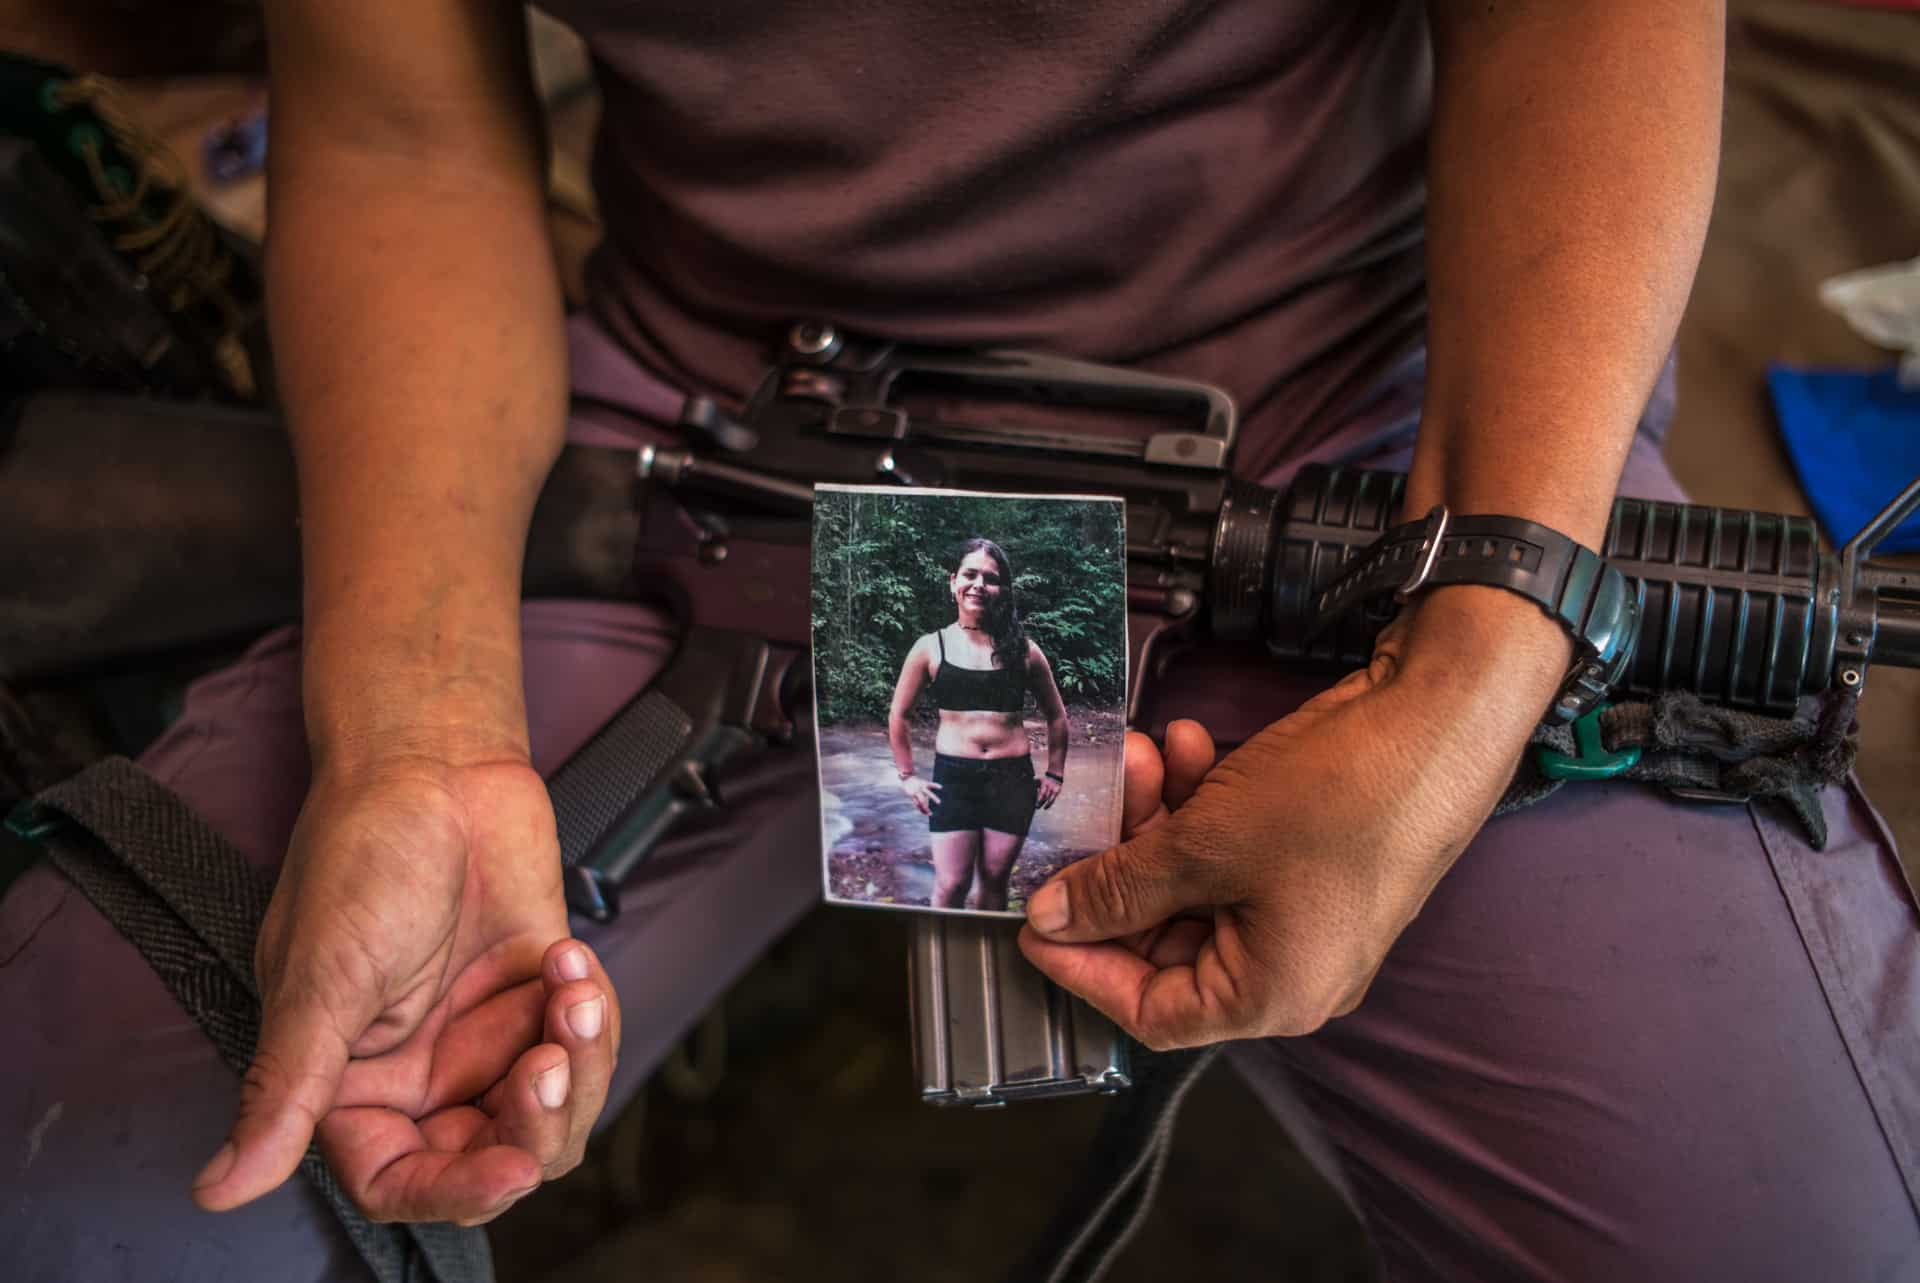 Arredondo_Juan_Photojournalism_FARC_030